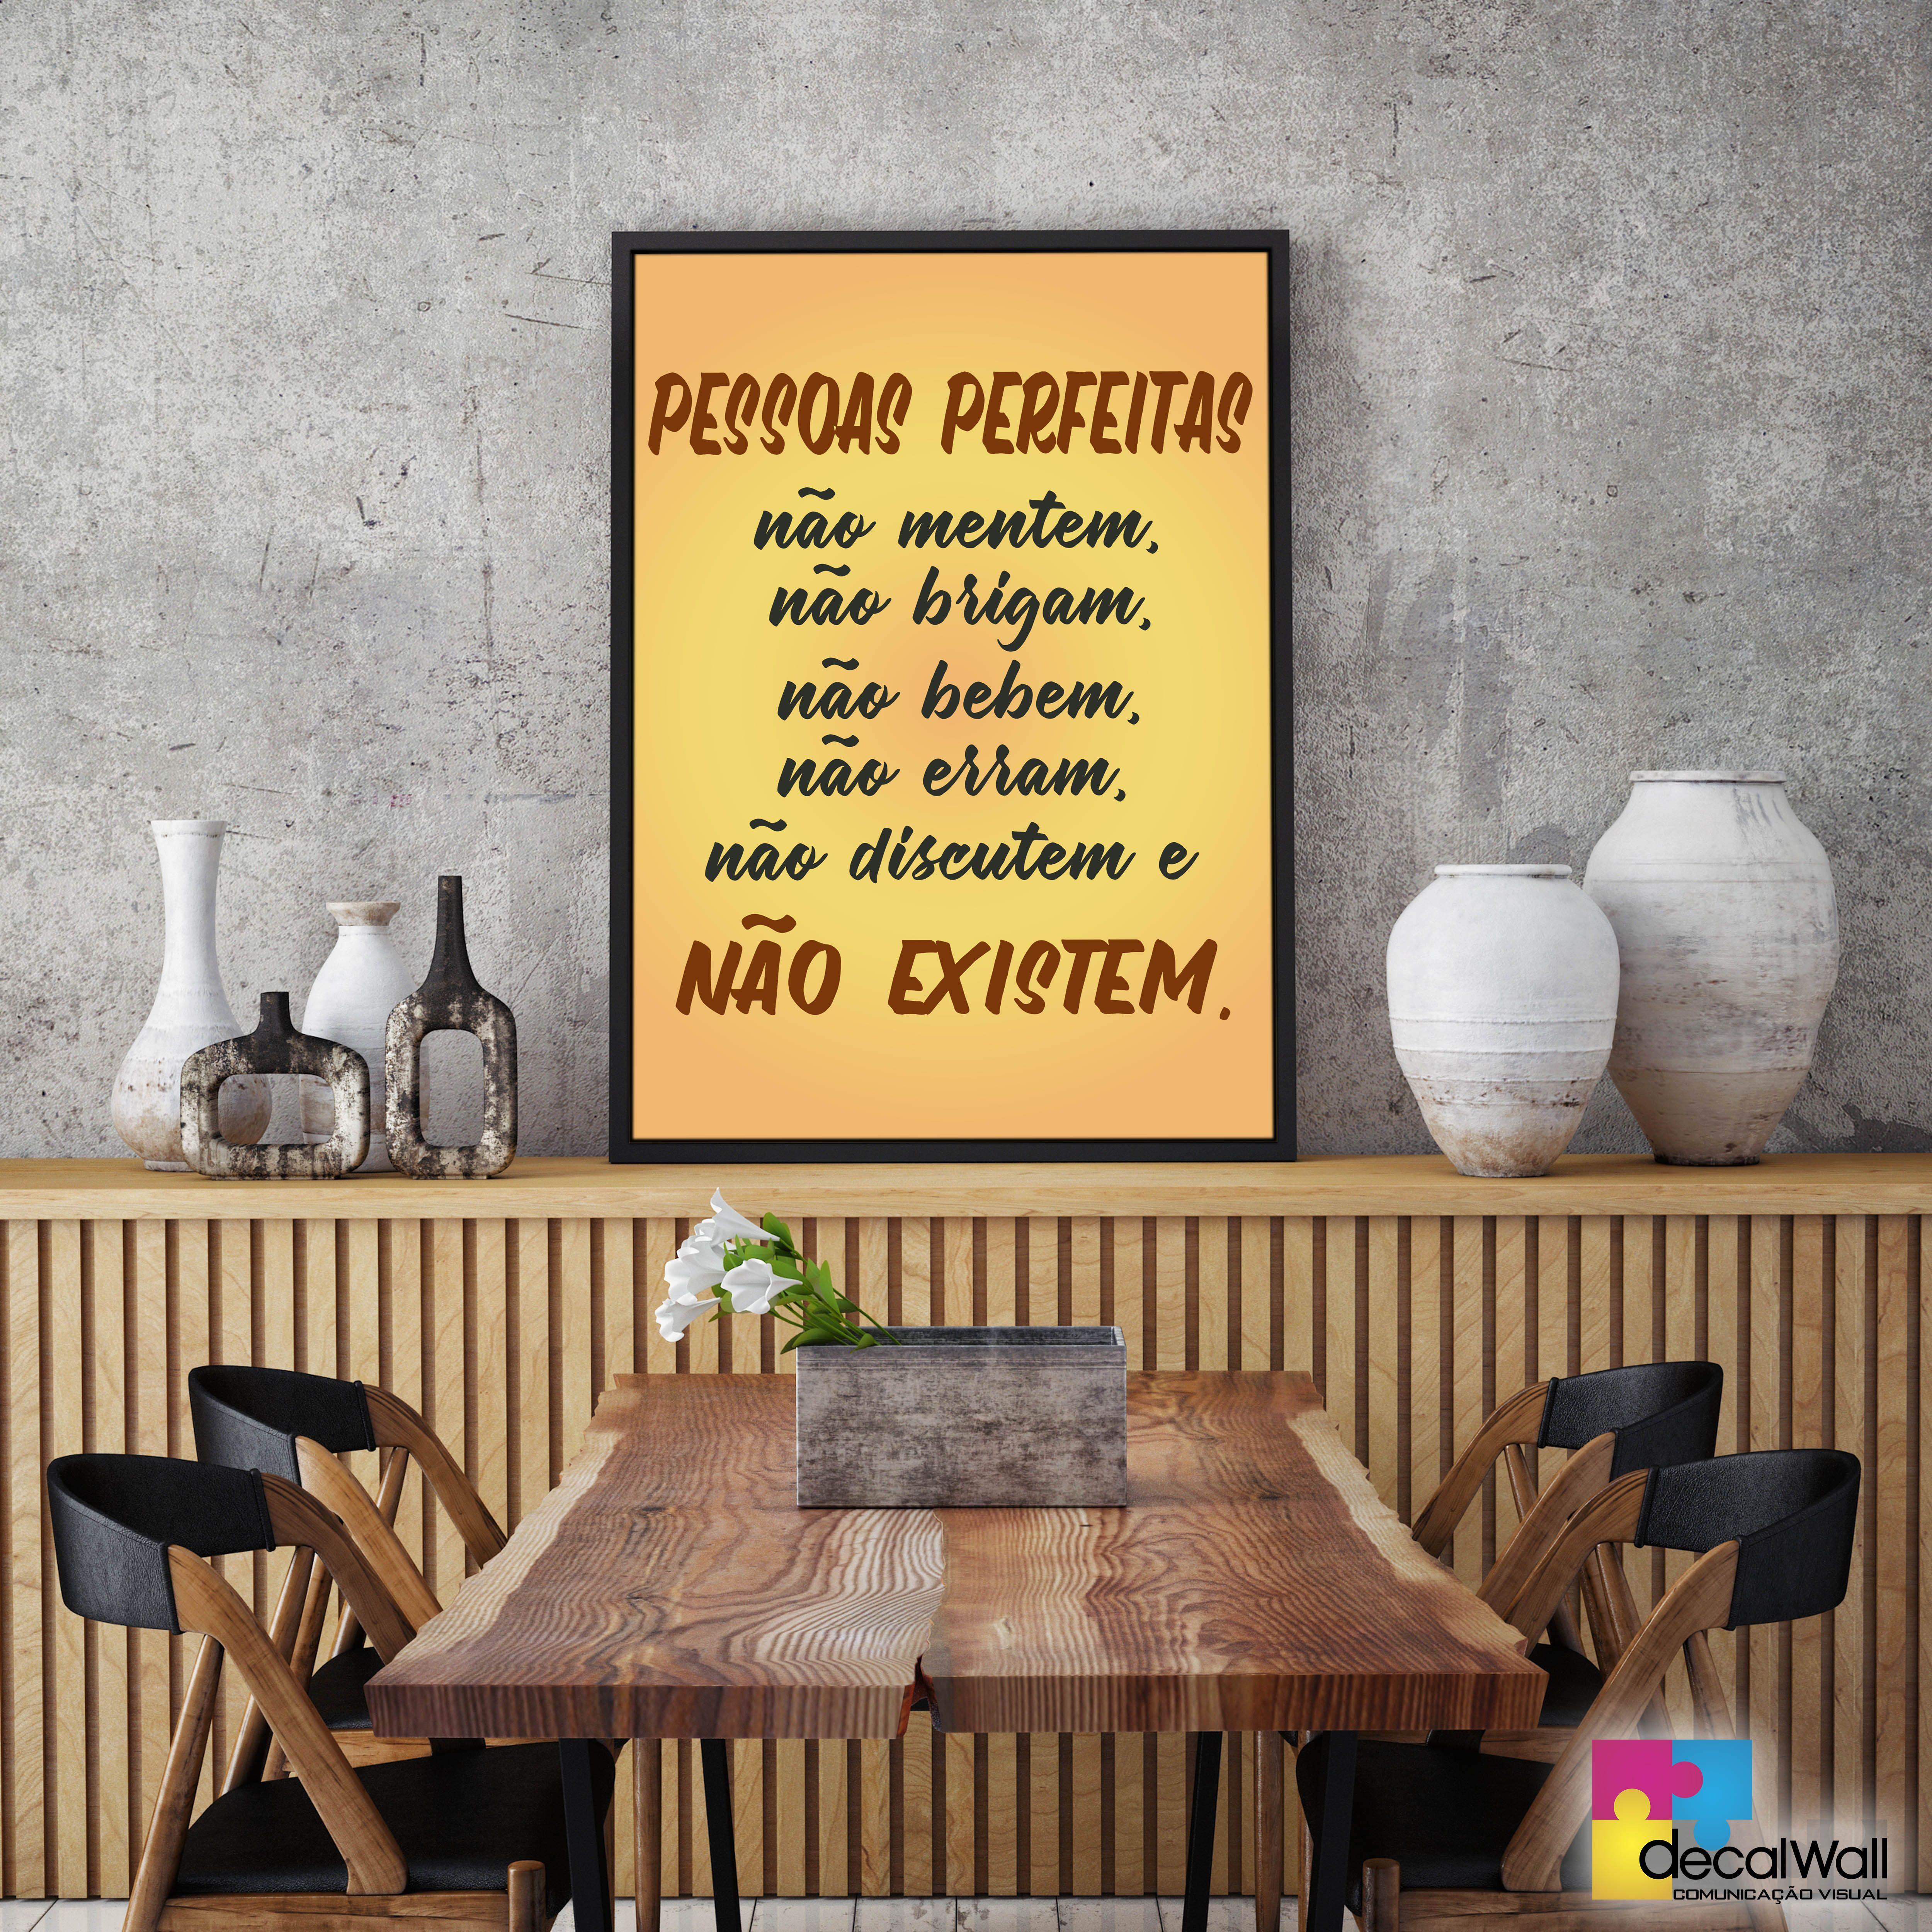 Pin by DecalWall Comunicação Visual on Frases | Pinterest